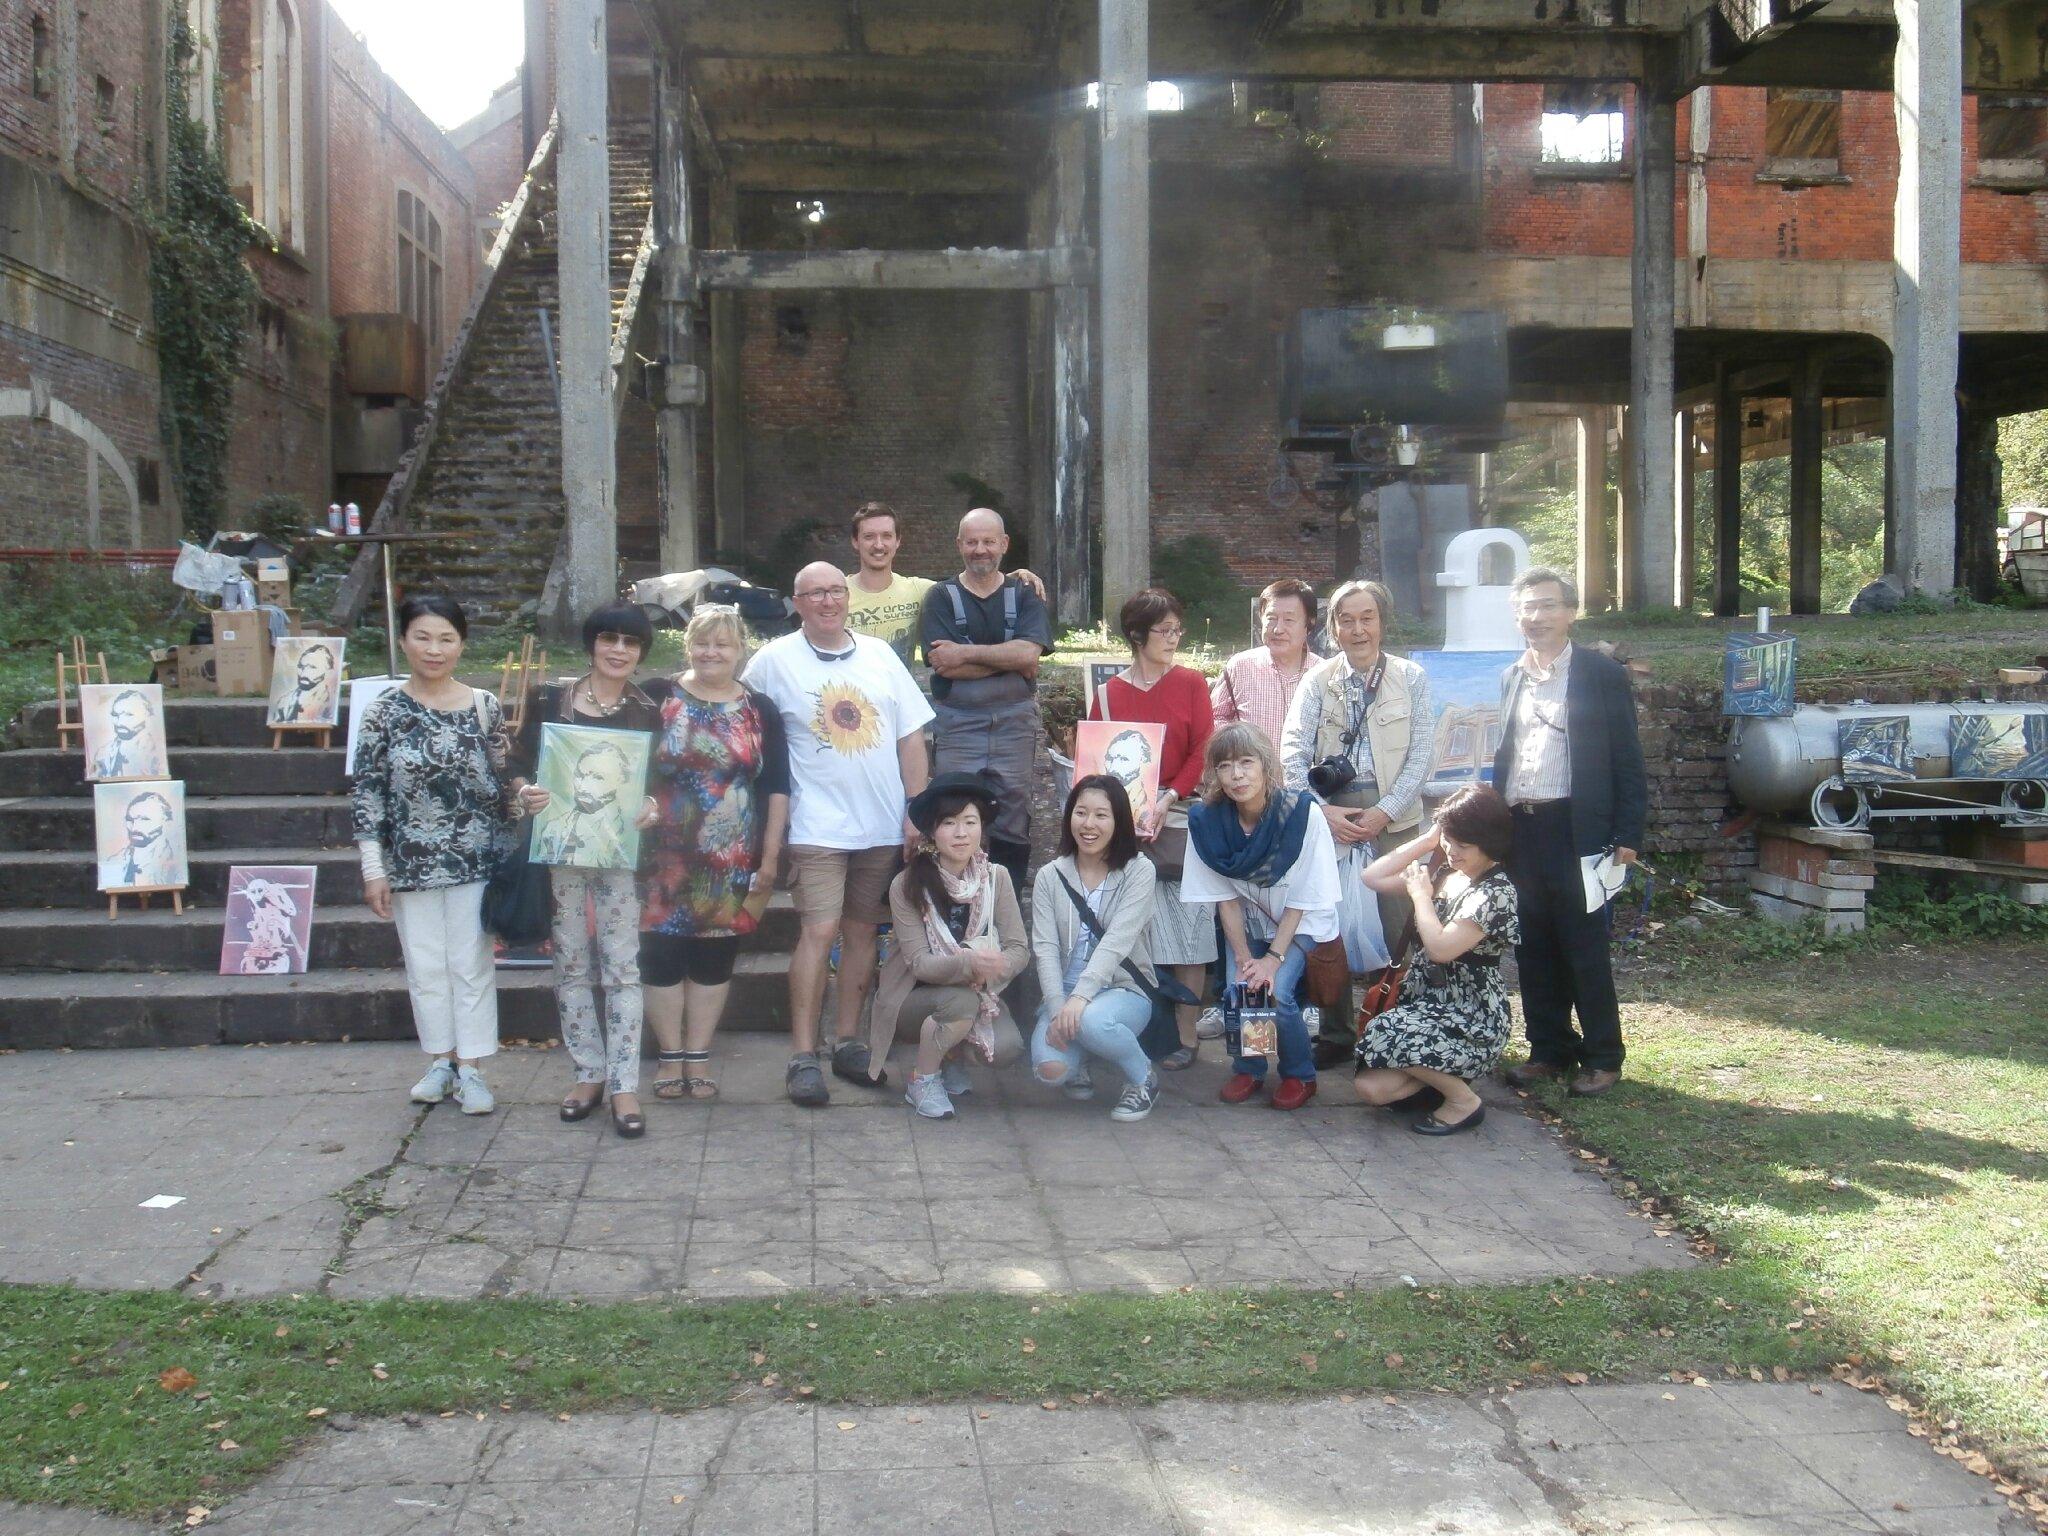 Japanese visit - 2016-09-10 - P9101919